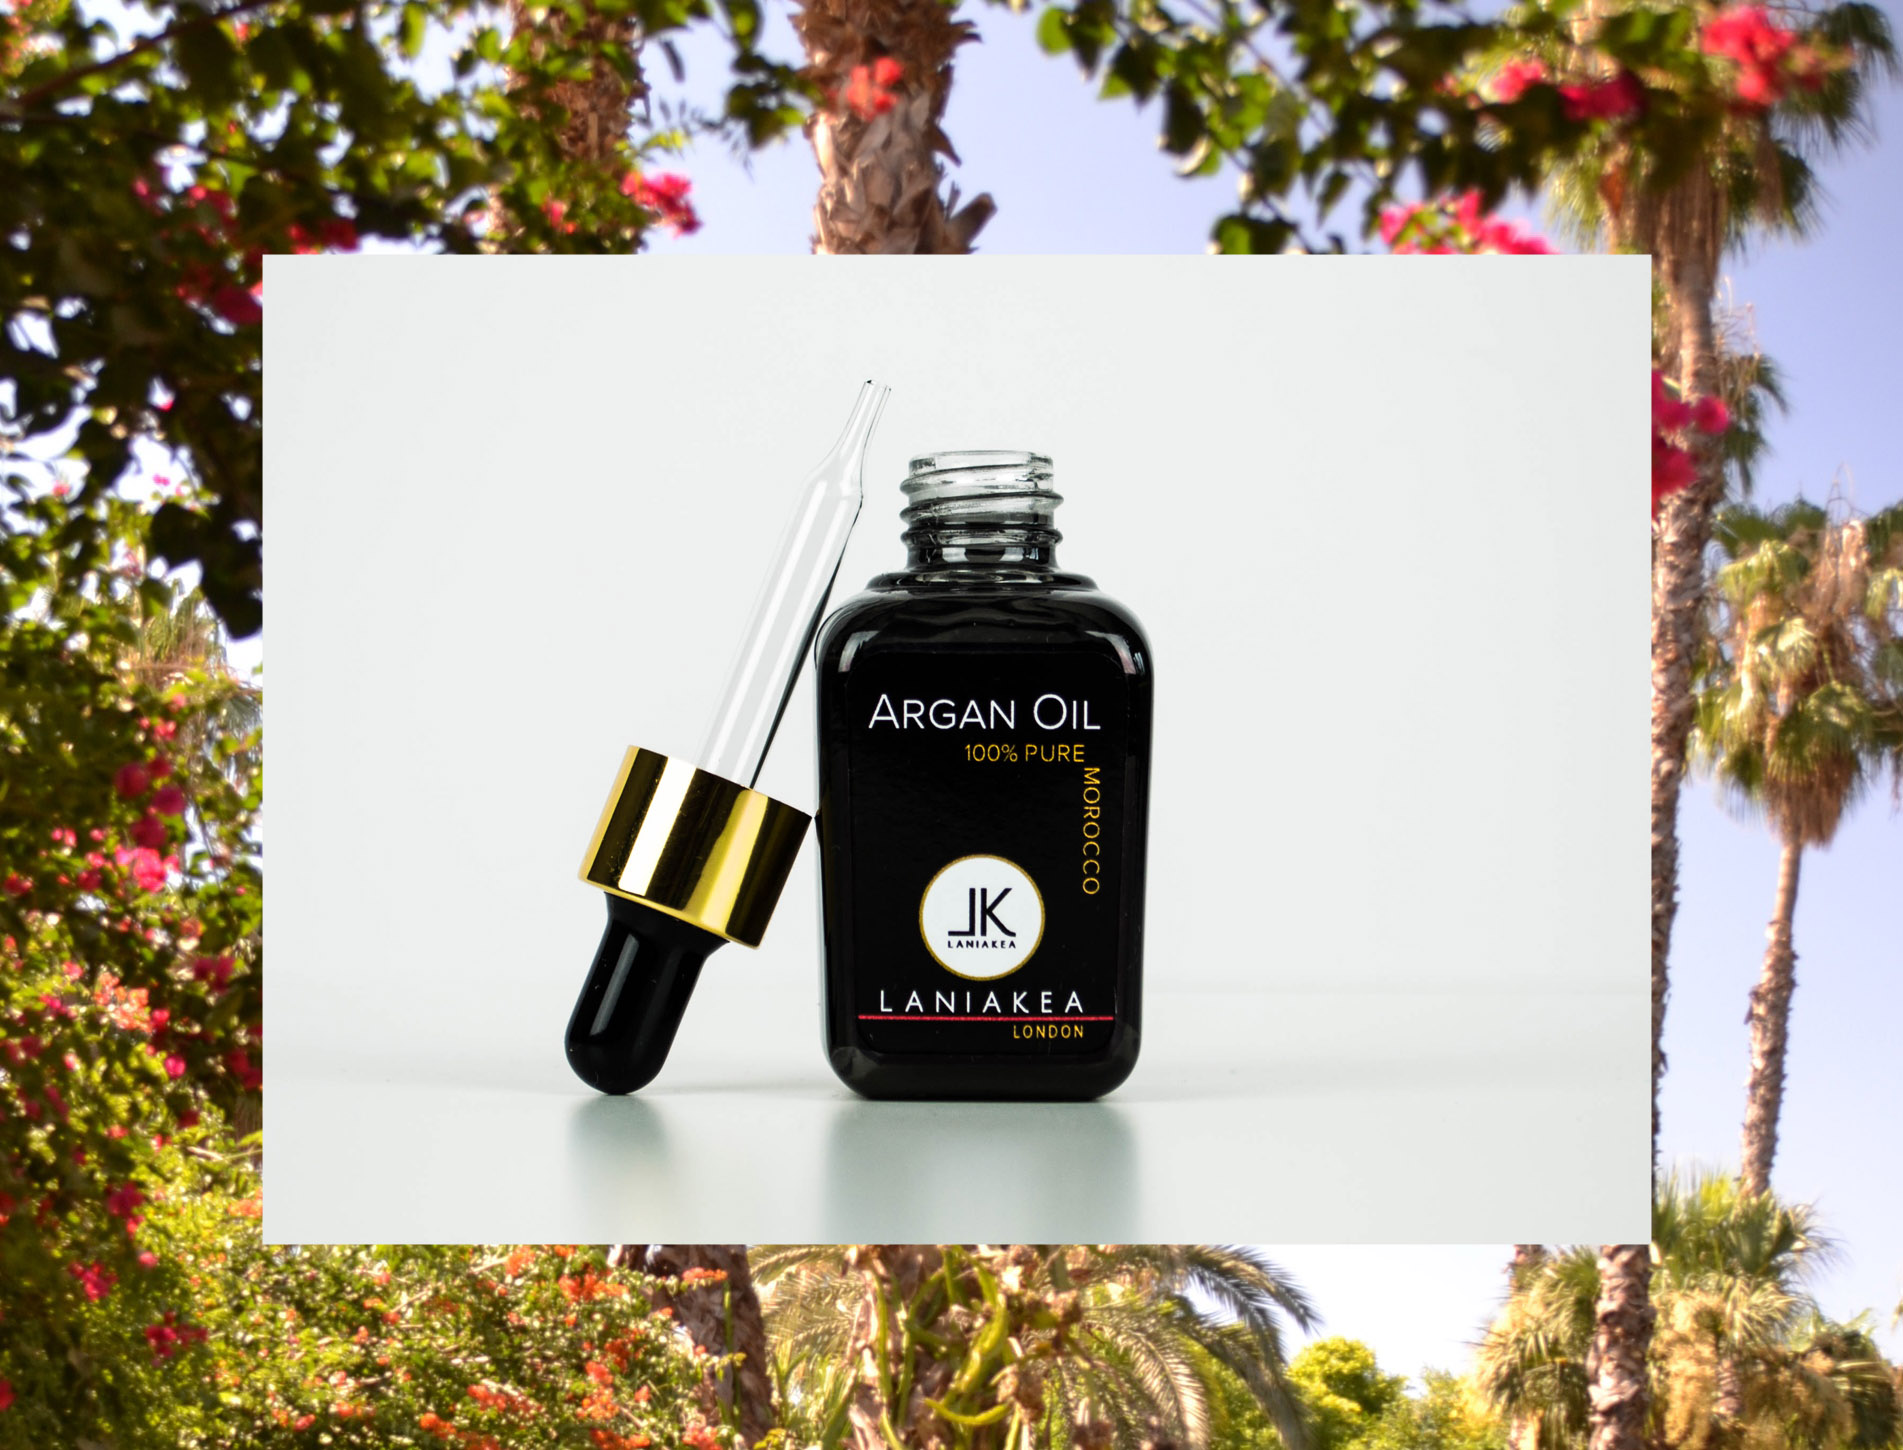 laniakea argan oil